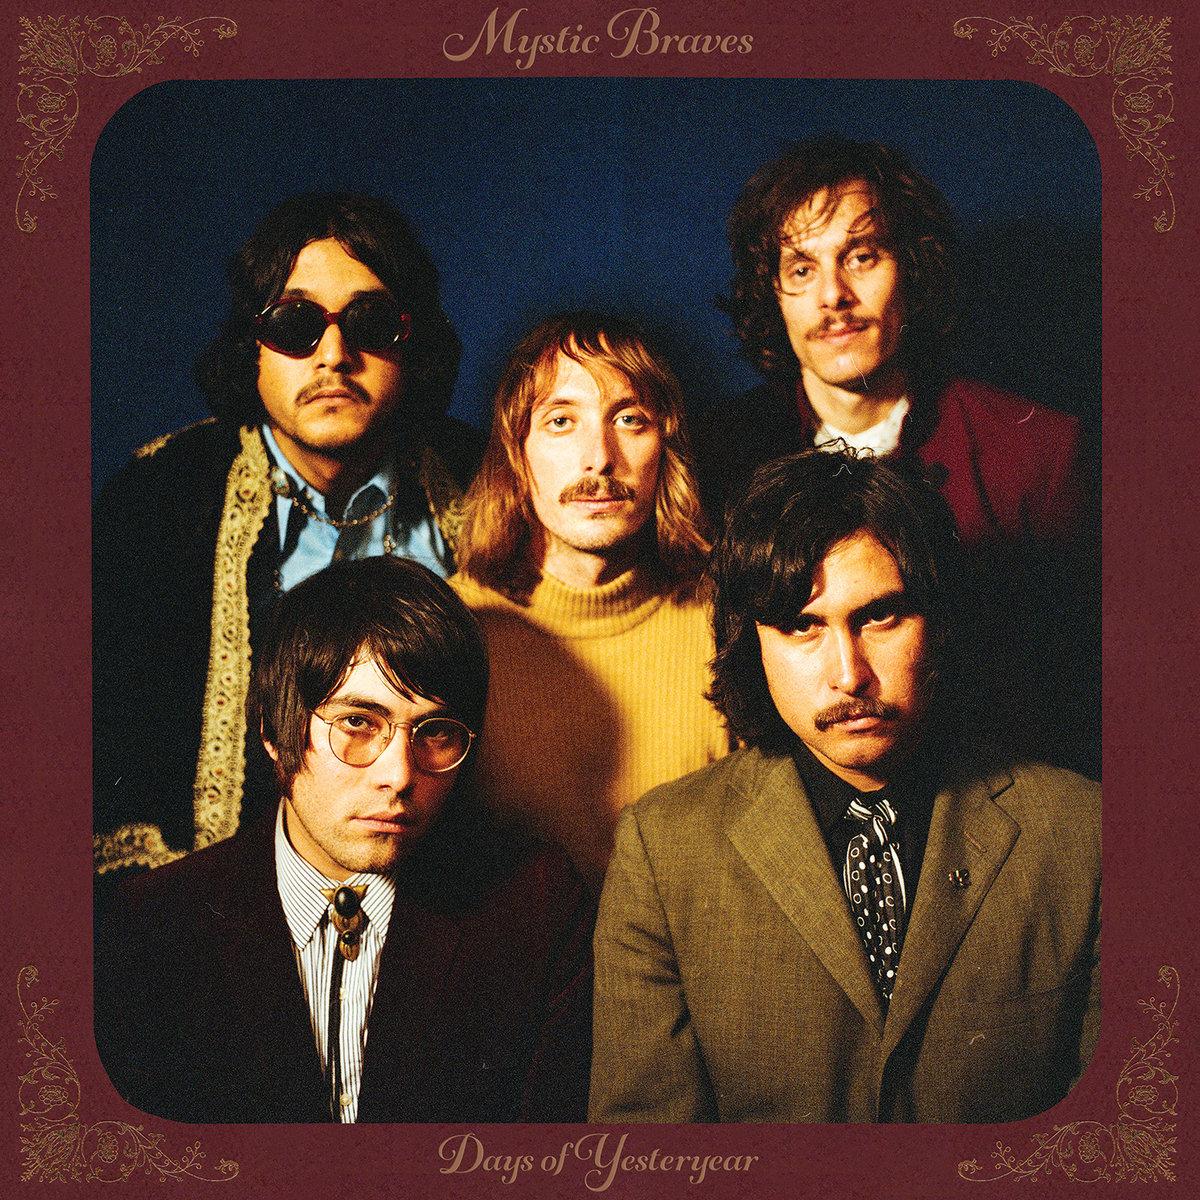 Mystic Braves - Days of Yesteryear